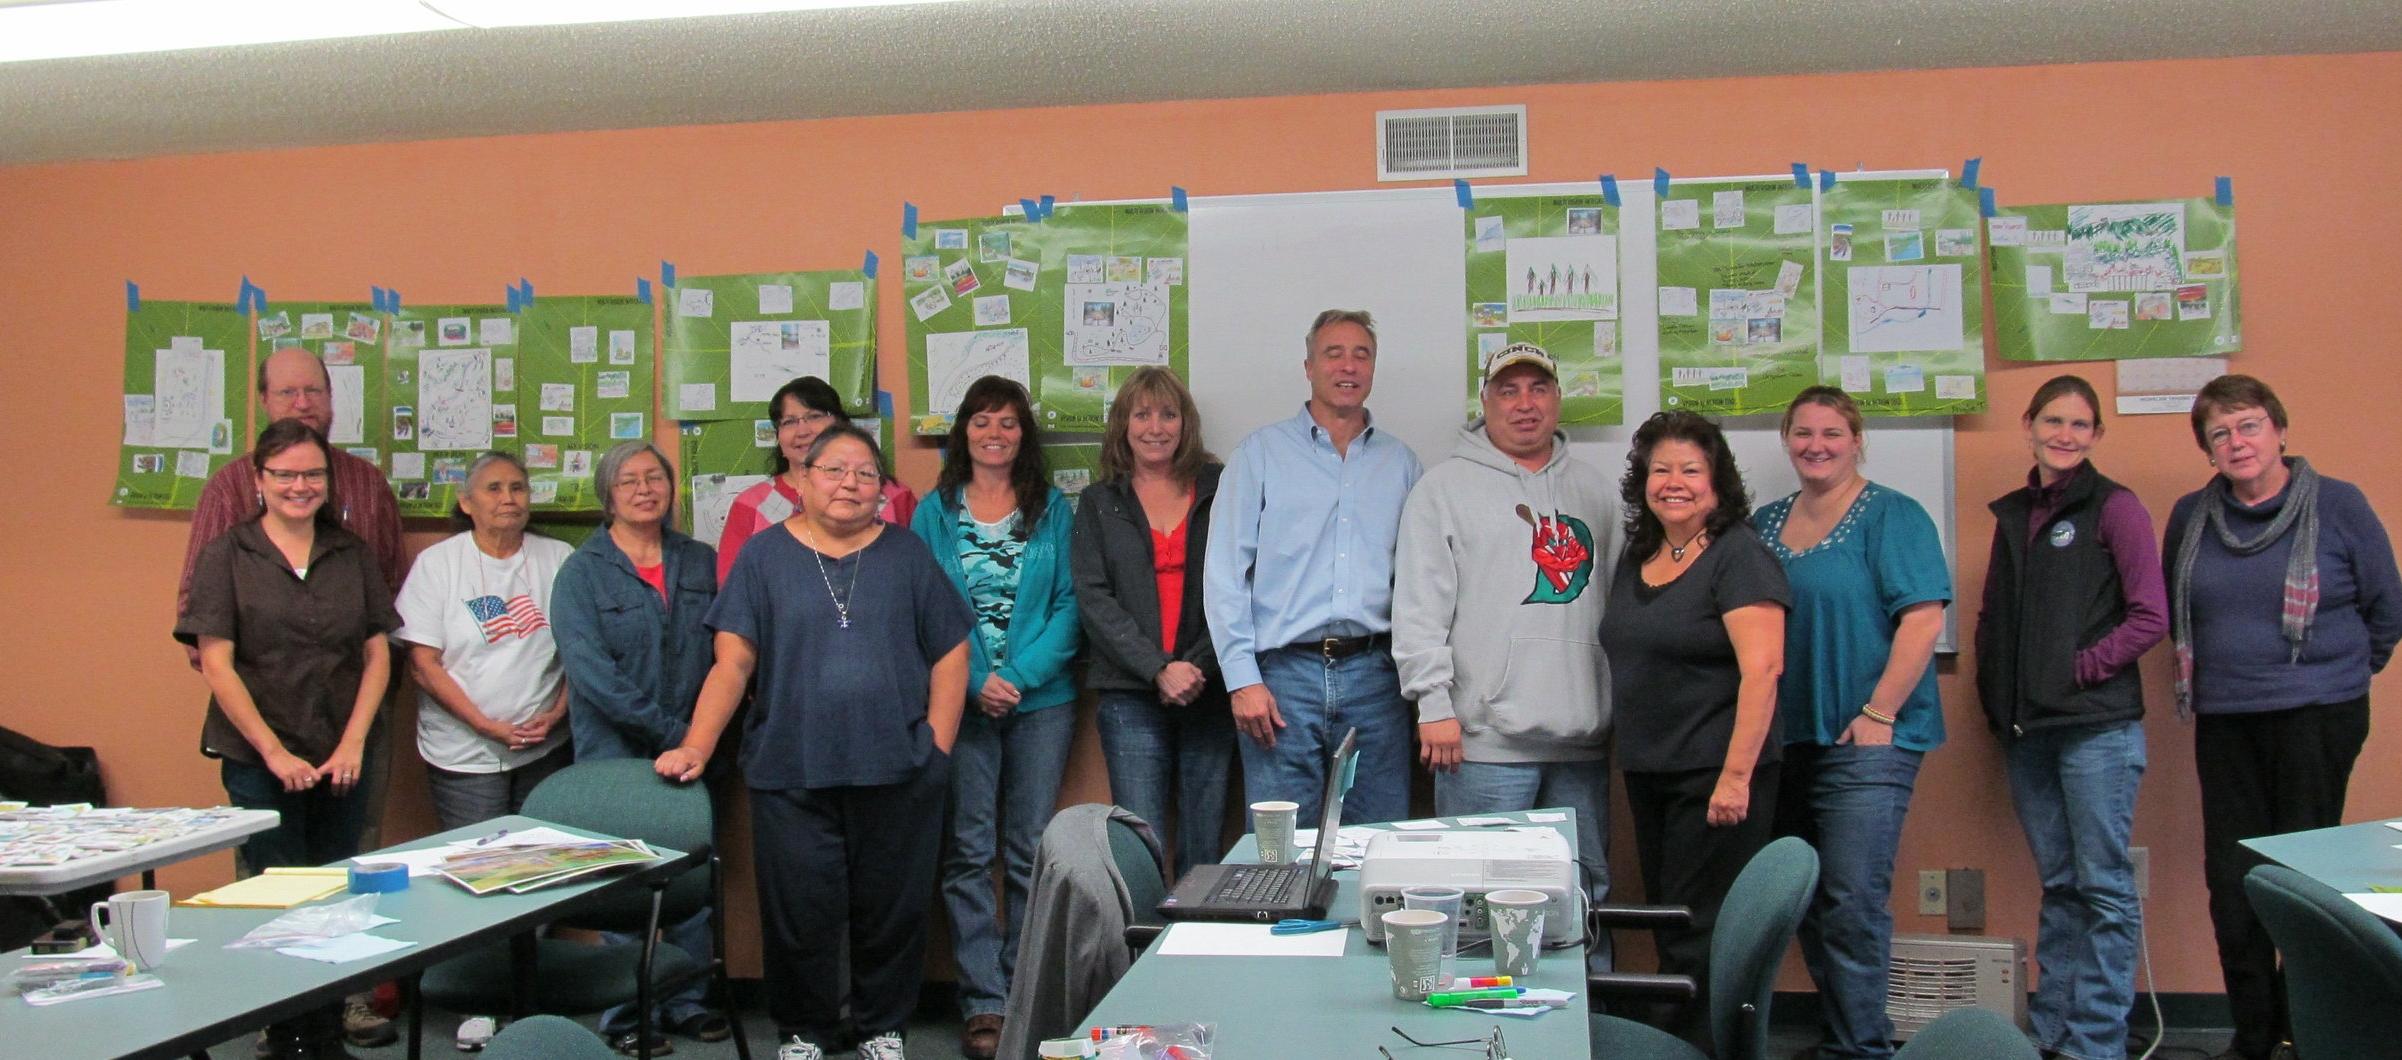 MVI2A Workshop Group Picture.JPG